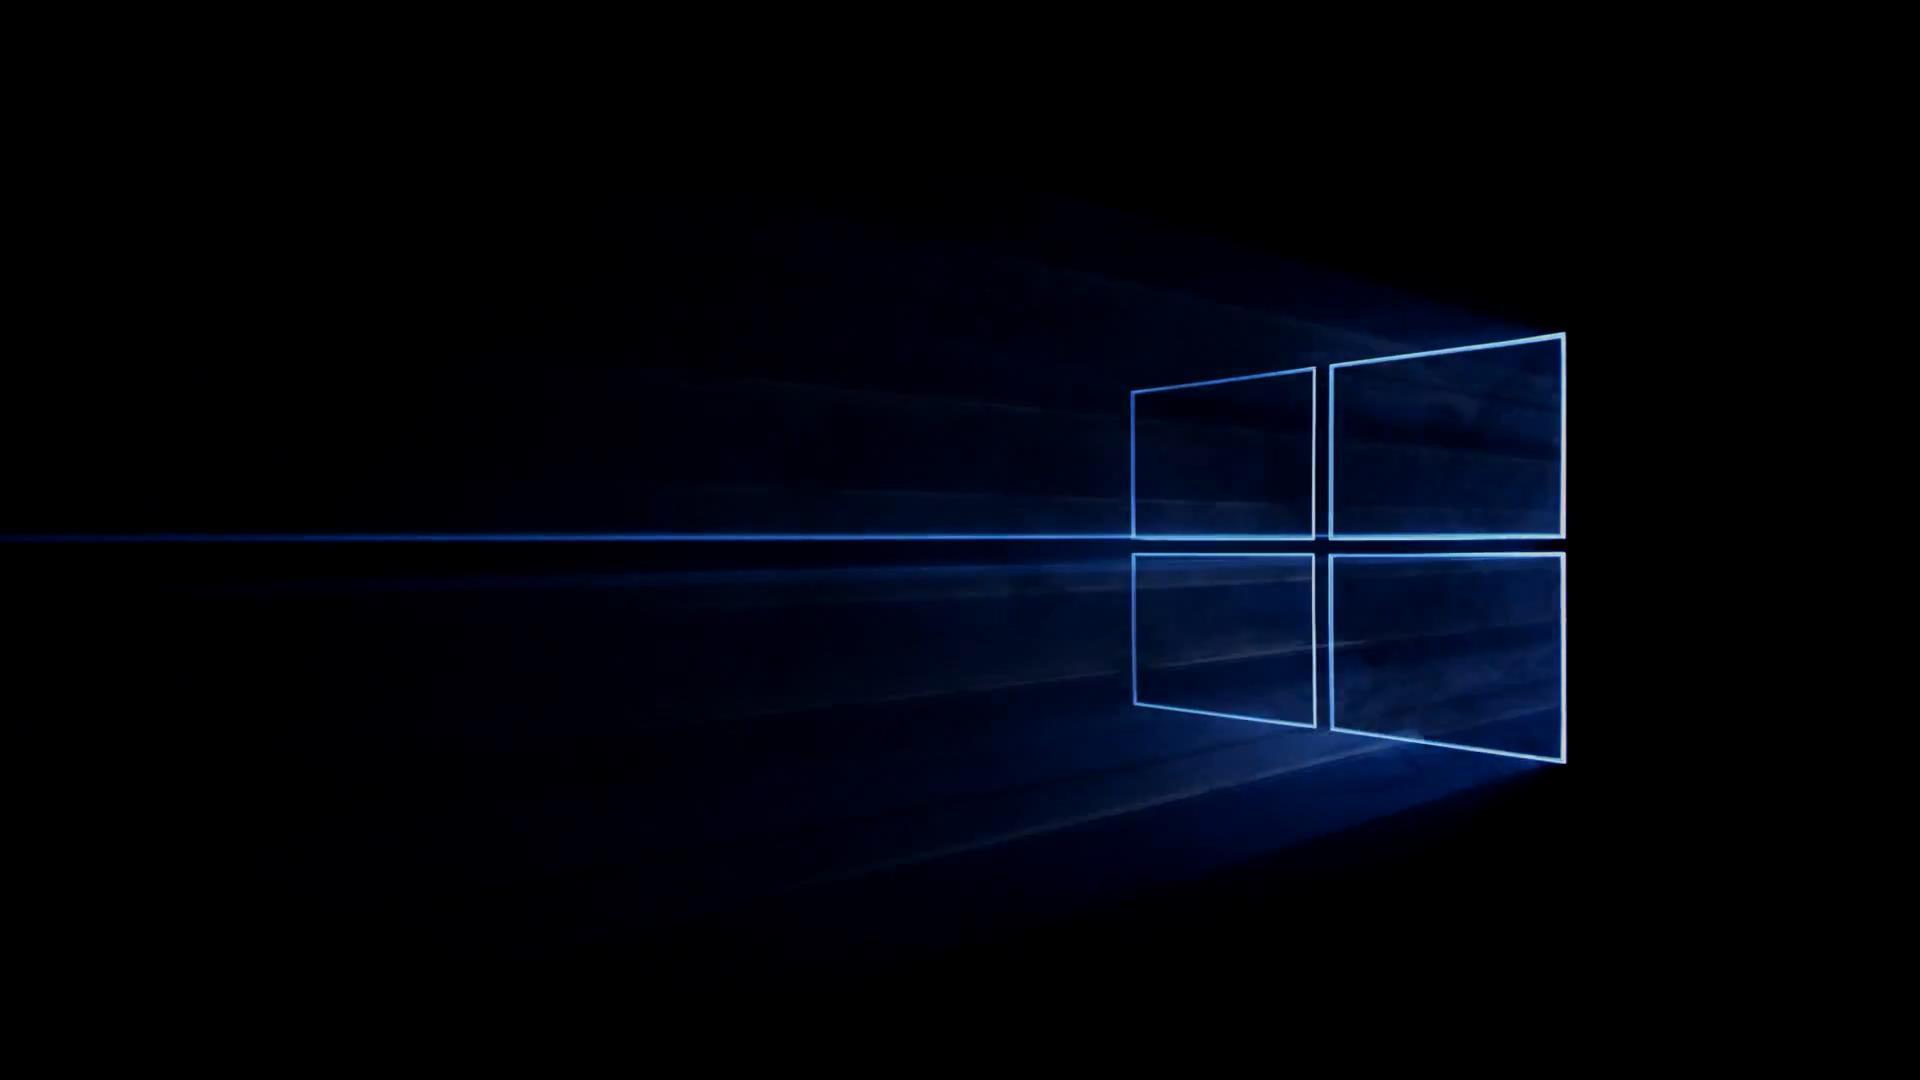 Windows 10 Wallpaper 4k 4 Supportive Guru